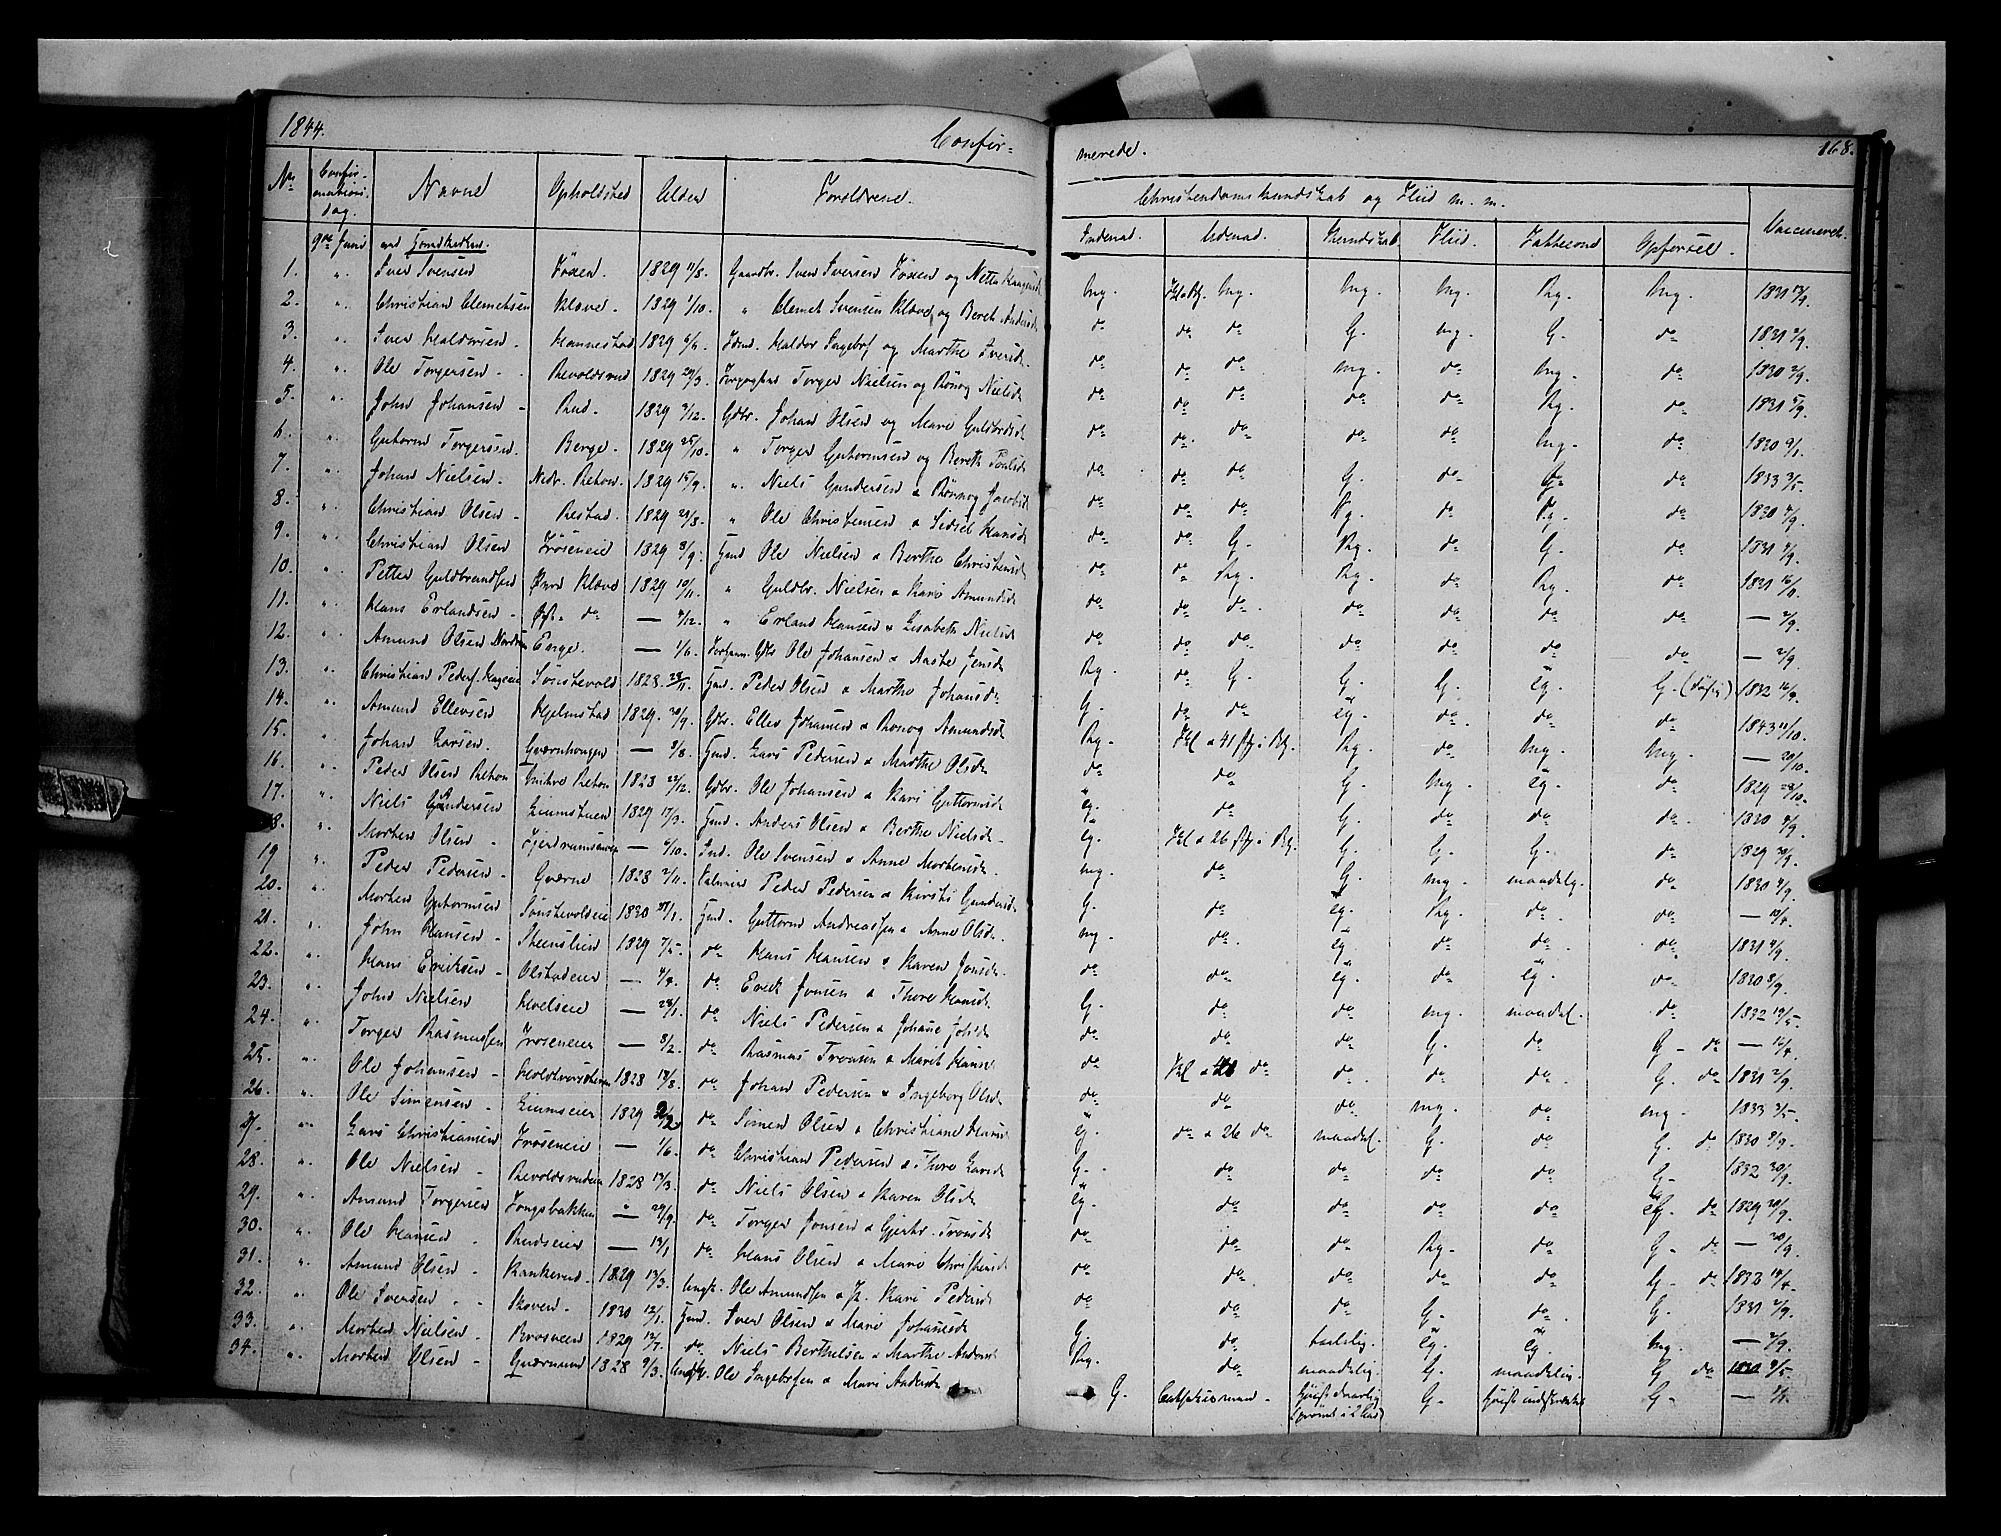 SAH, Gausdal prestekontor, Ministerialbok nr. 7, 1840-1850, s. 168